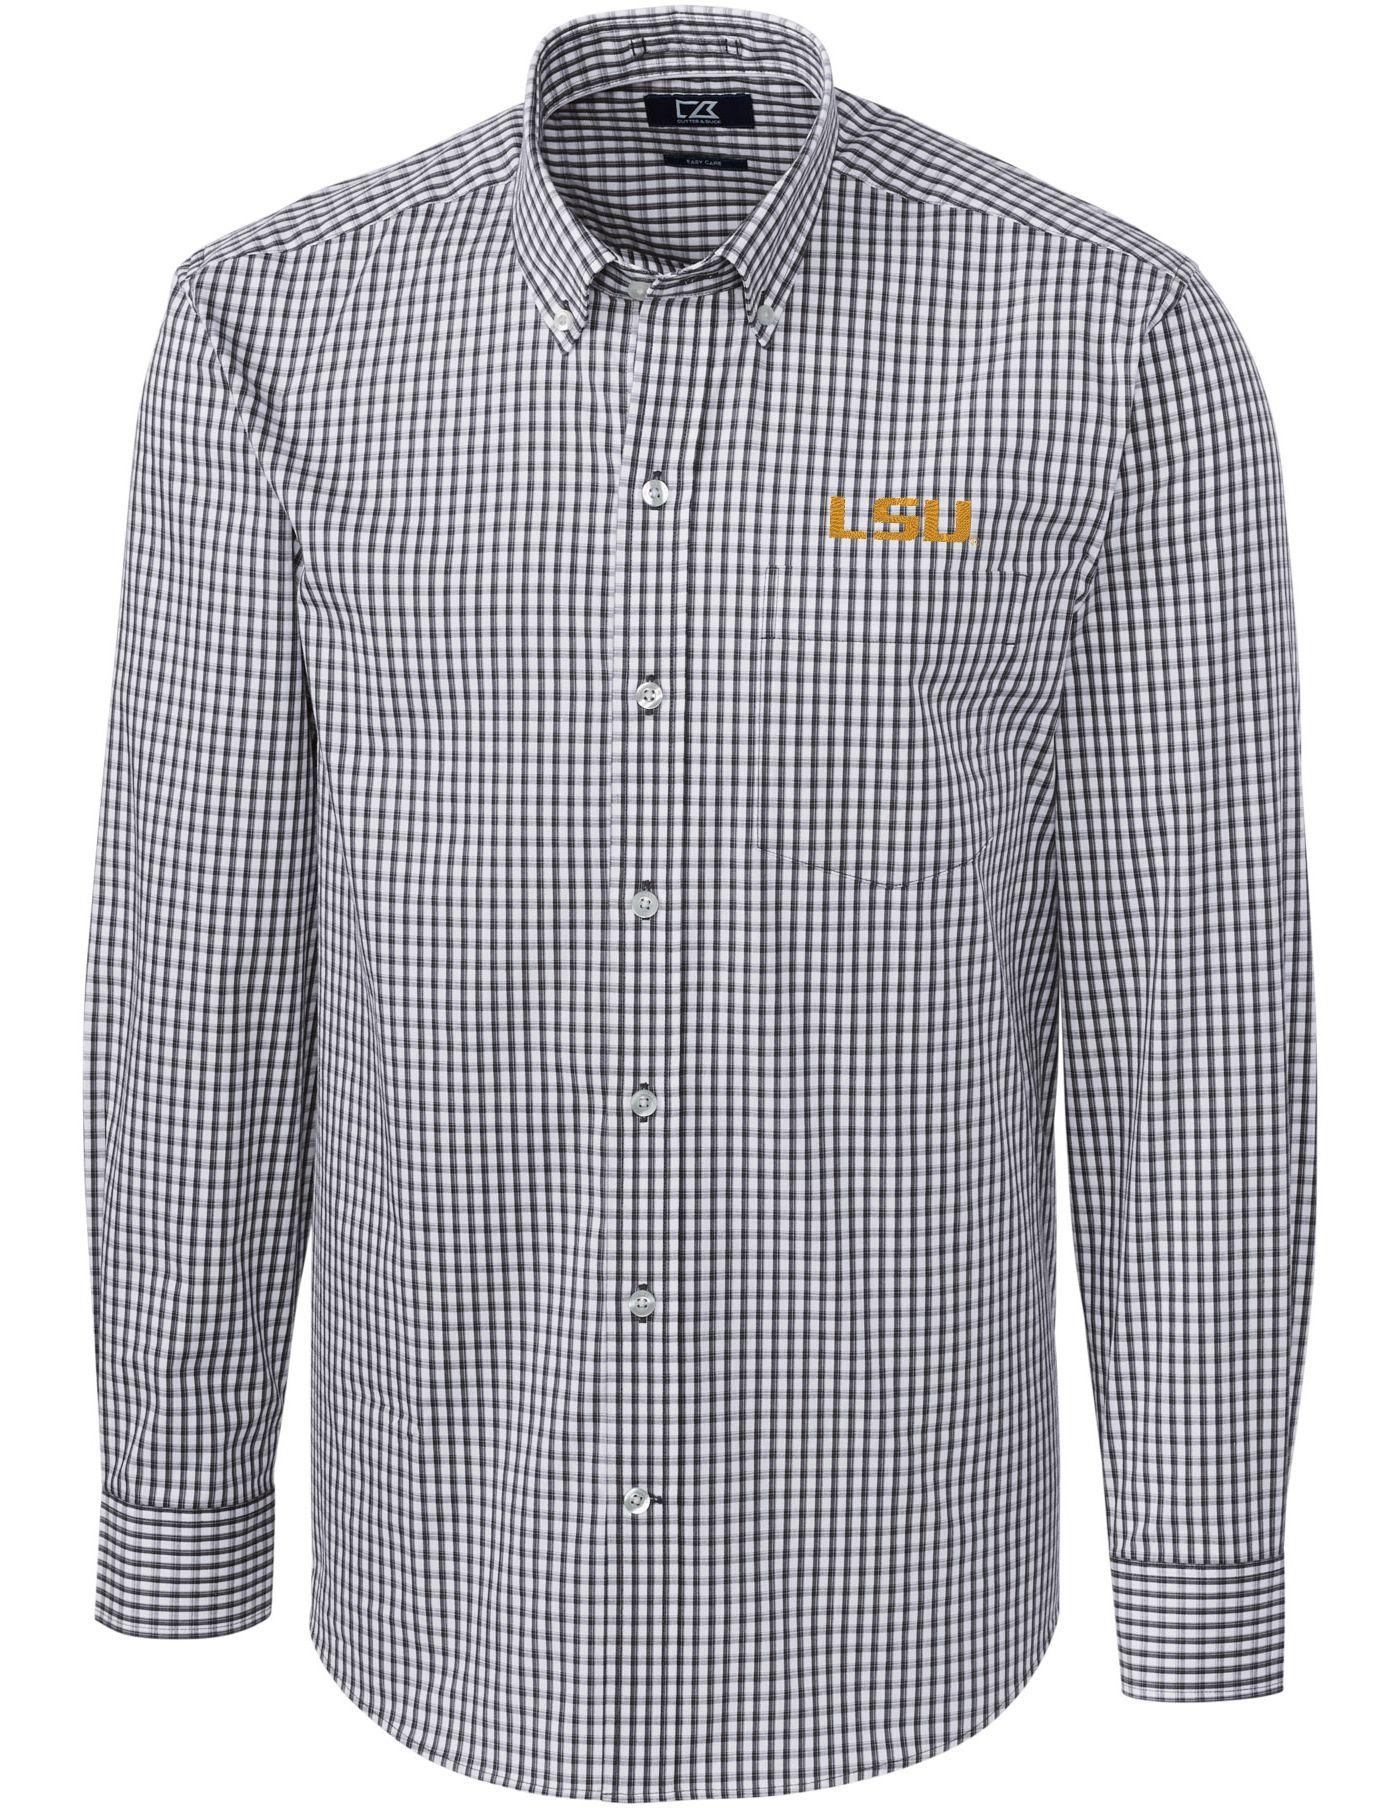 Cutter & Buck Men's LSU Tigers Grey Stretch Gingham Long Sleeve Shirt